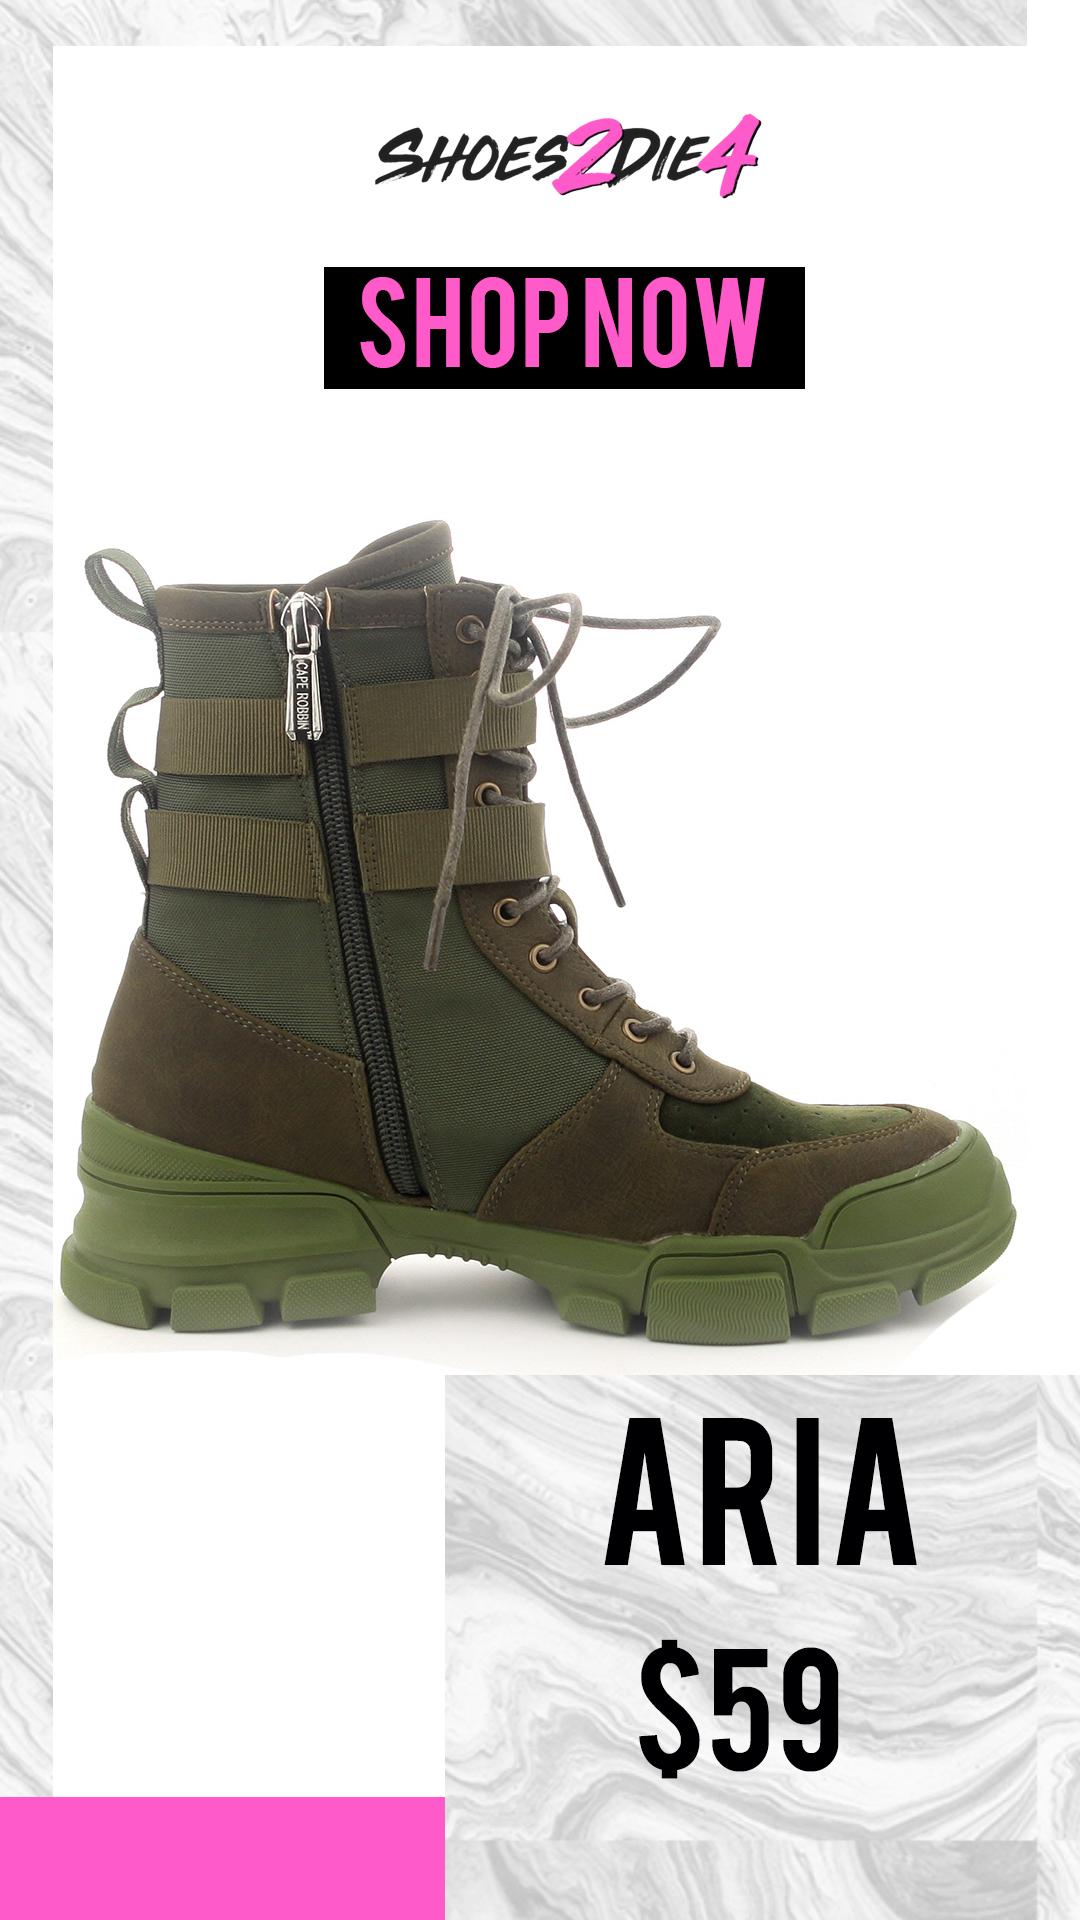 aria.olive copy.jpg